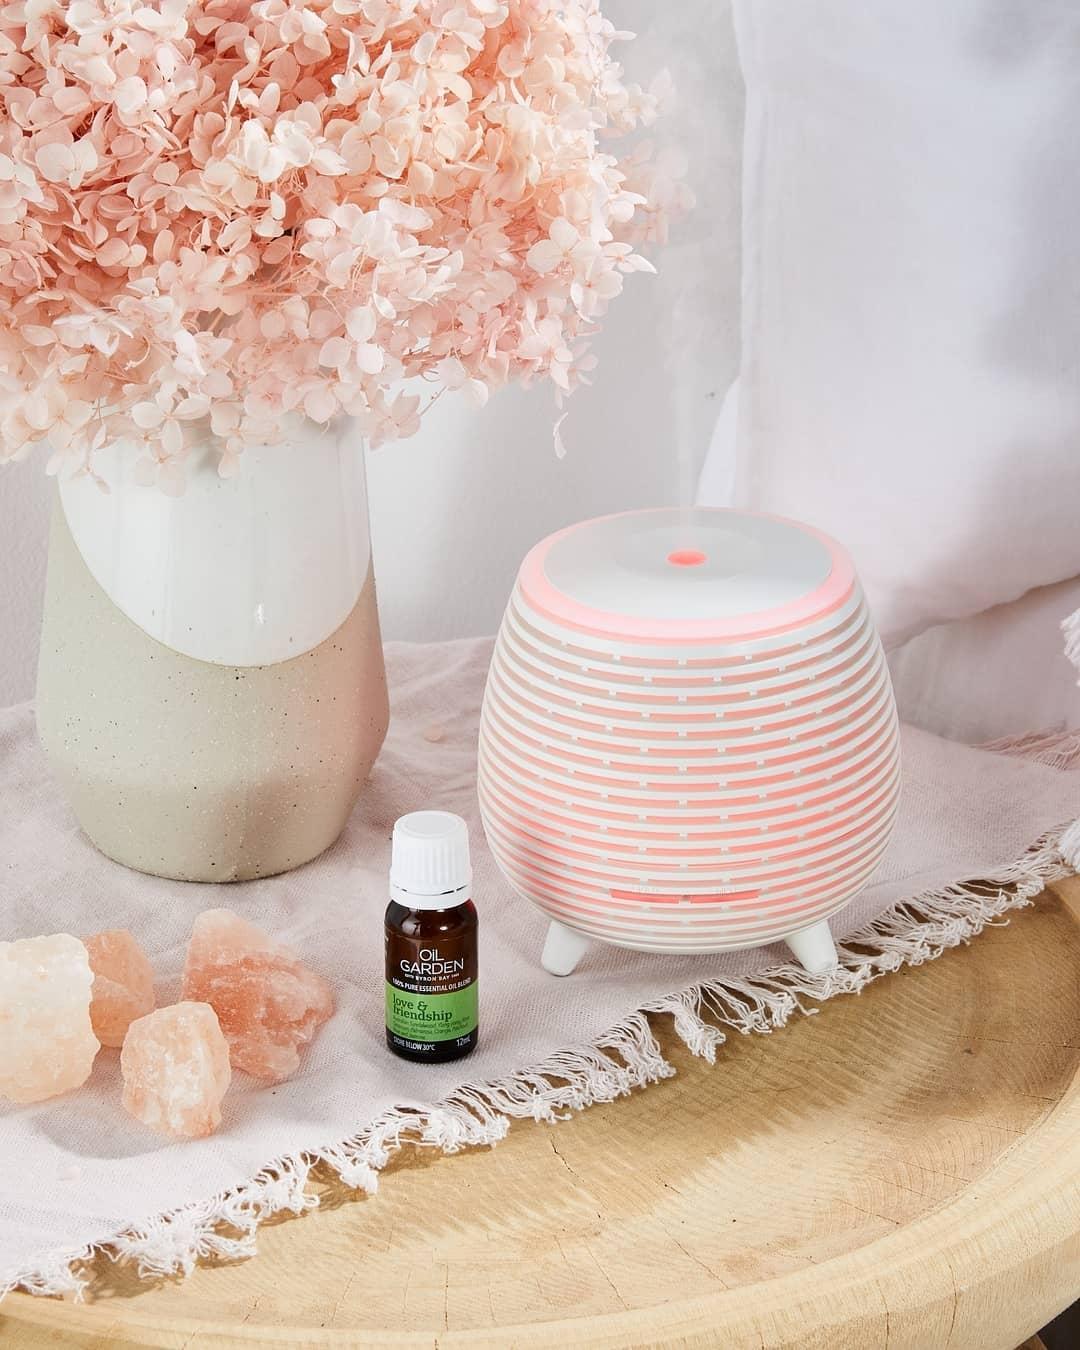 Oil Garden From the Heart Gift Set | WholeLife Pharmacy & Healthfoods